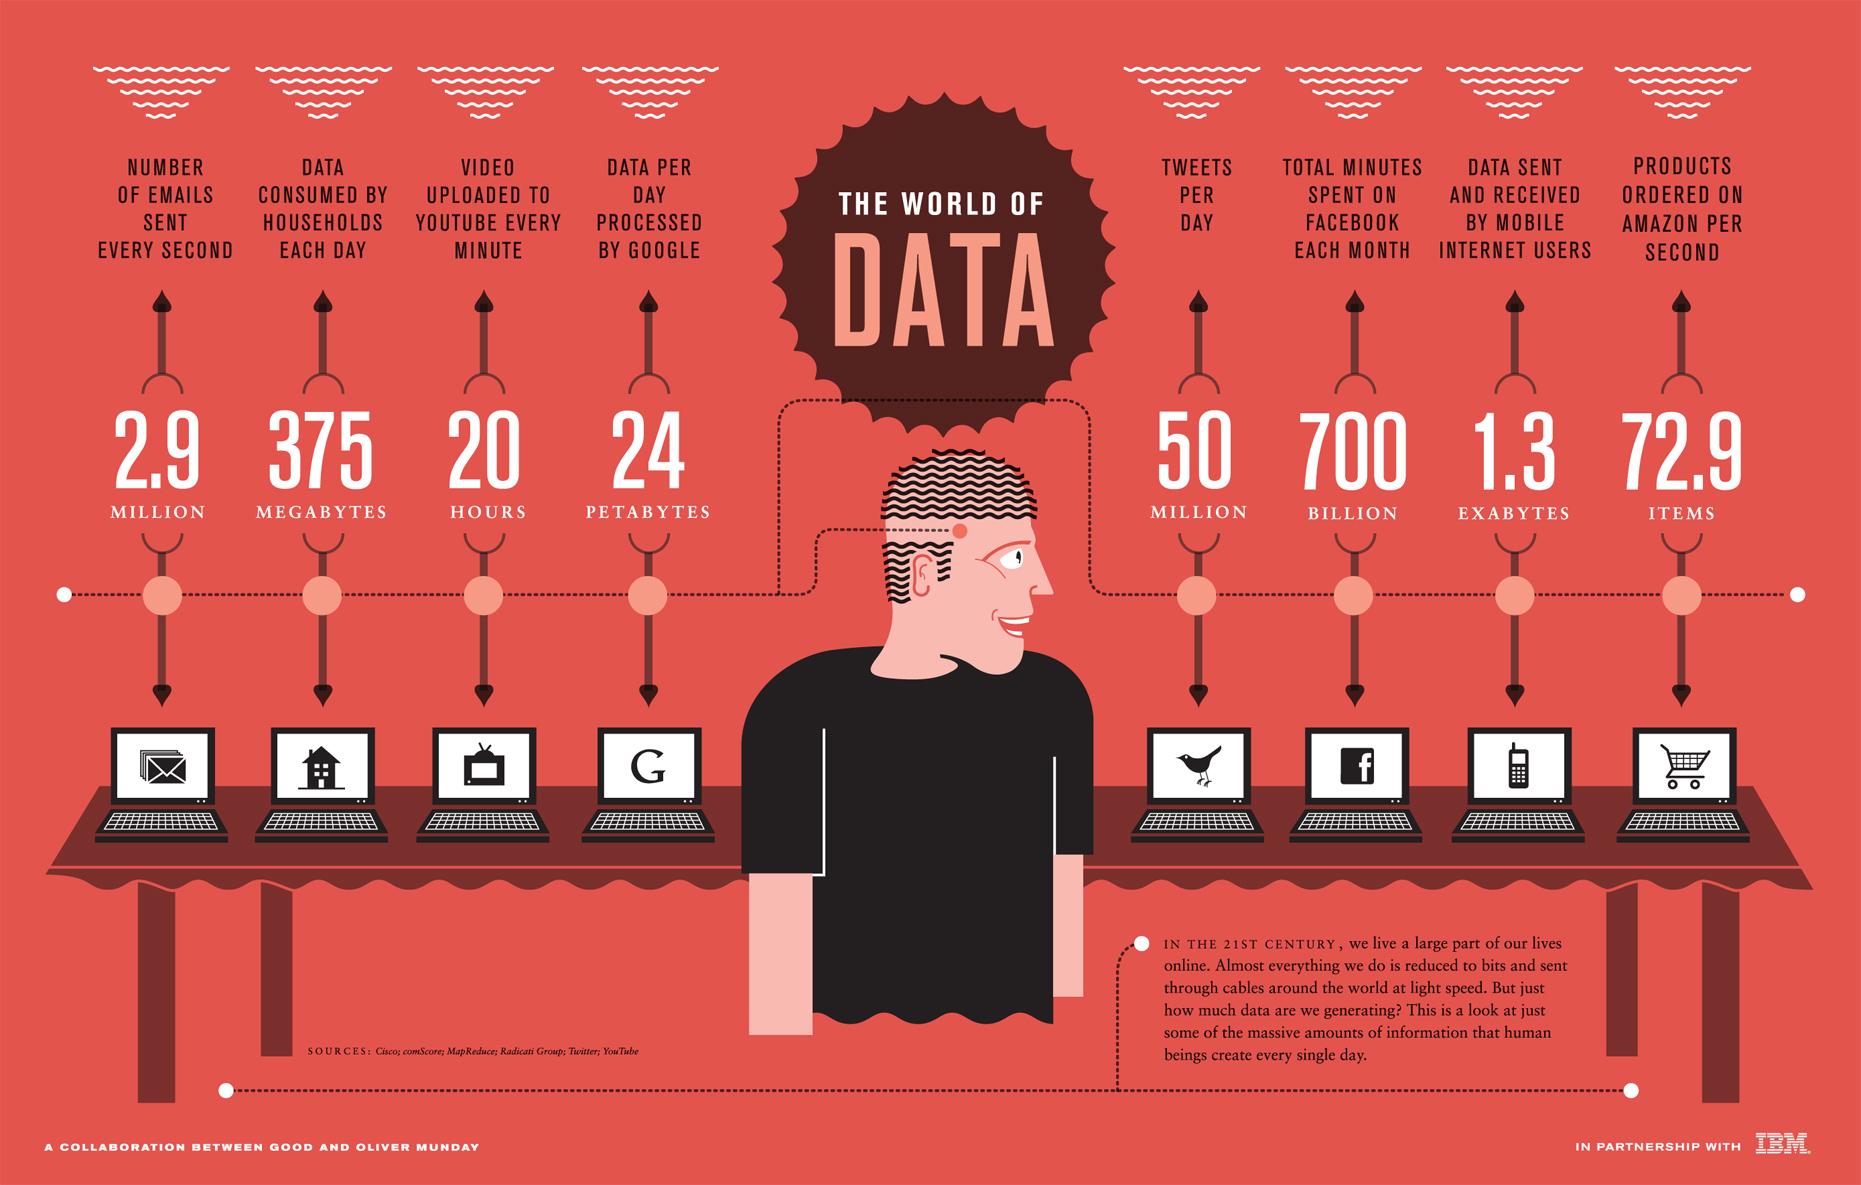 datancy